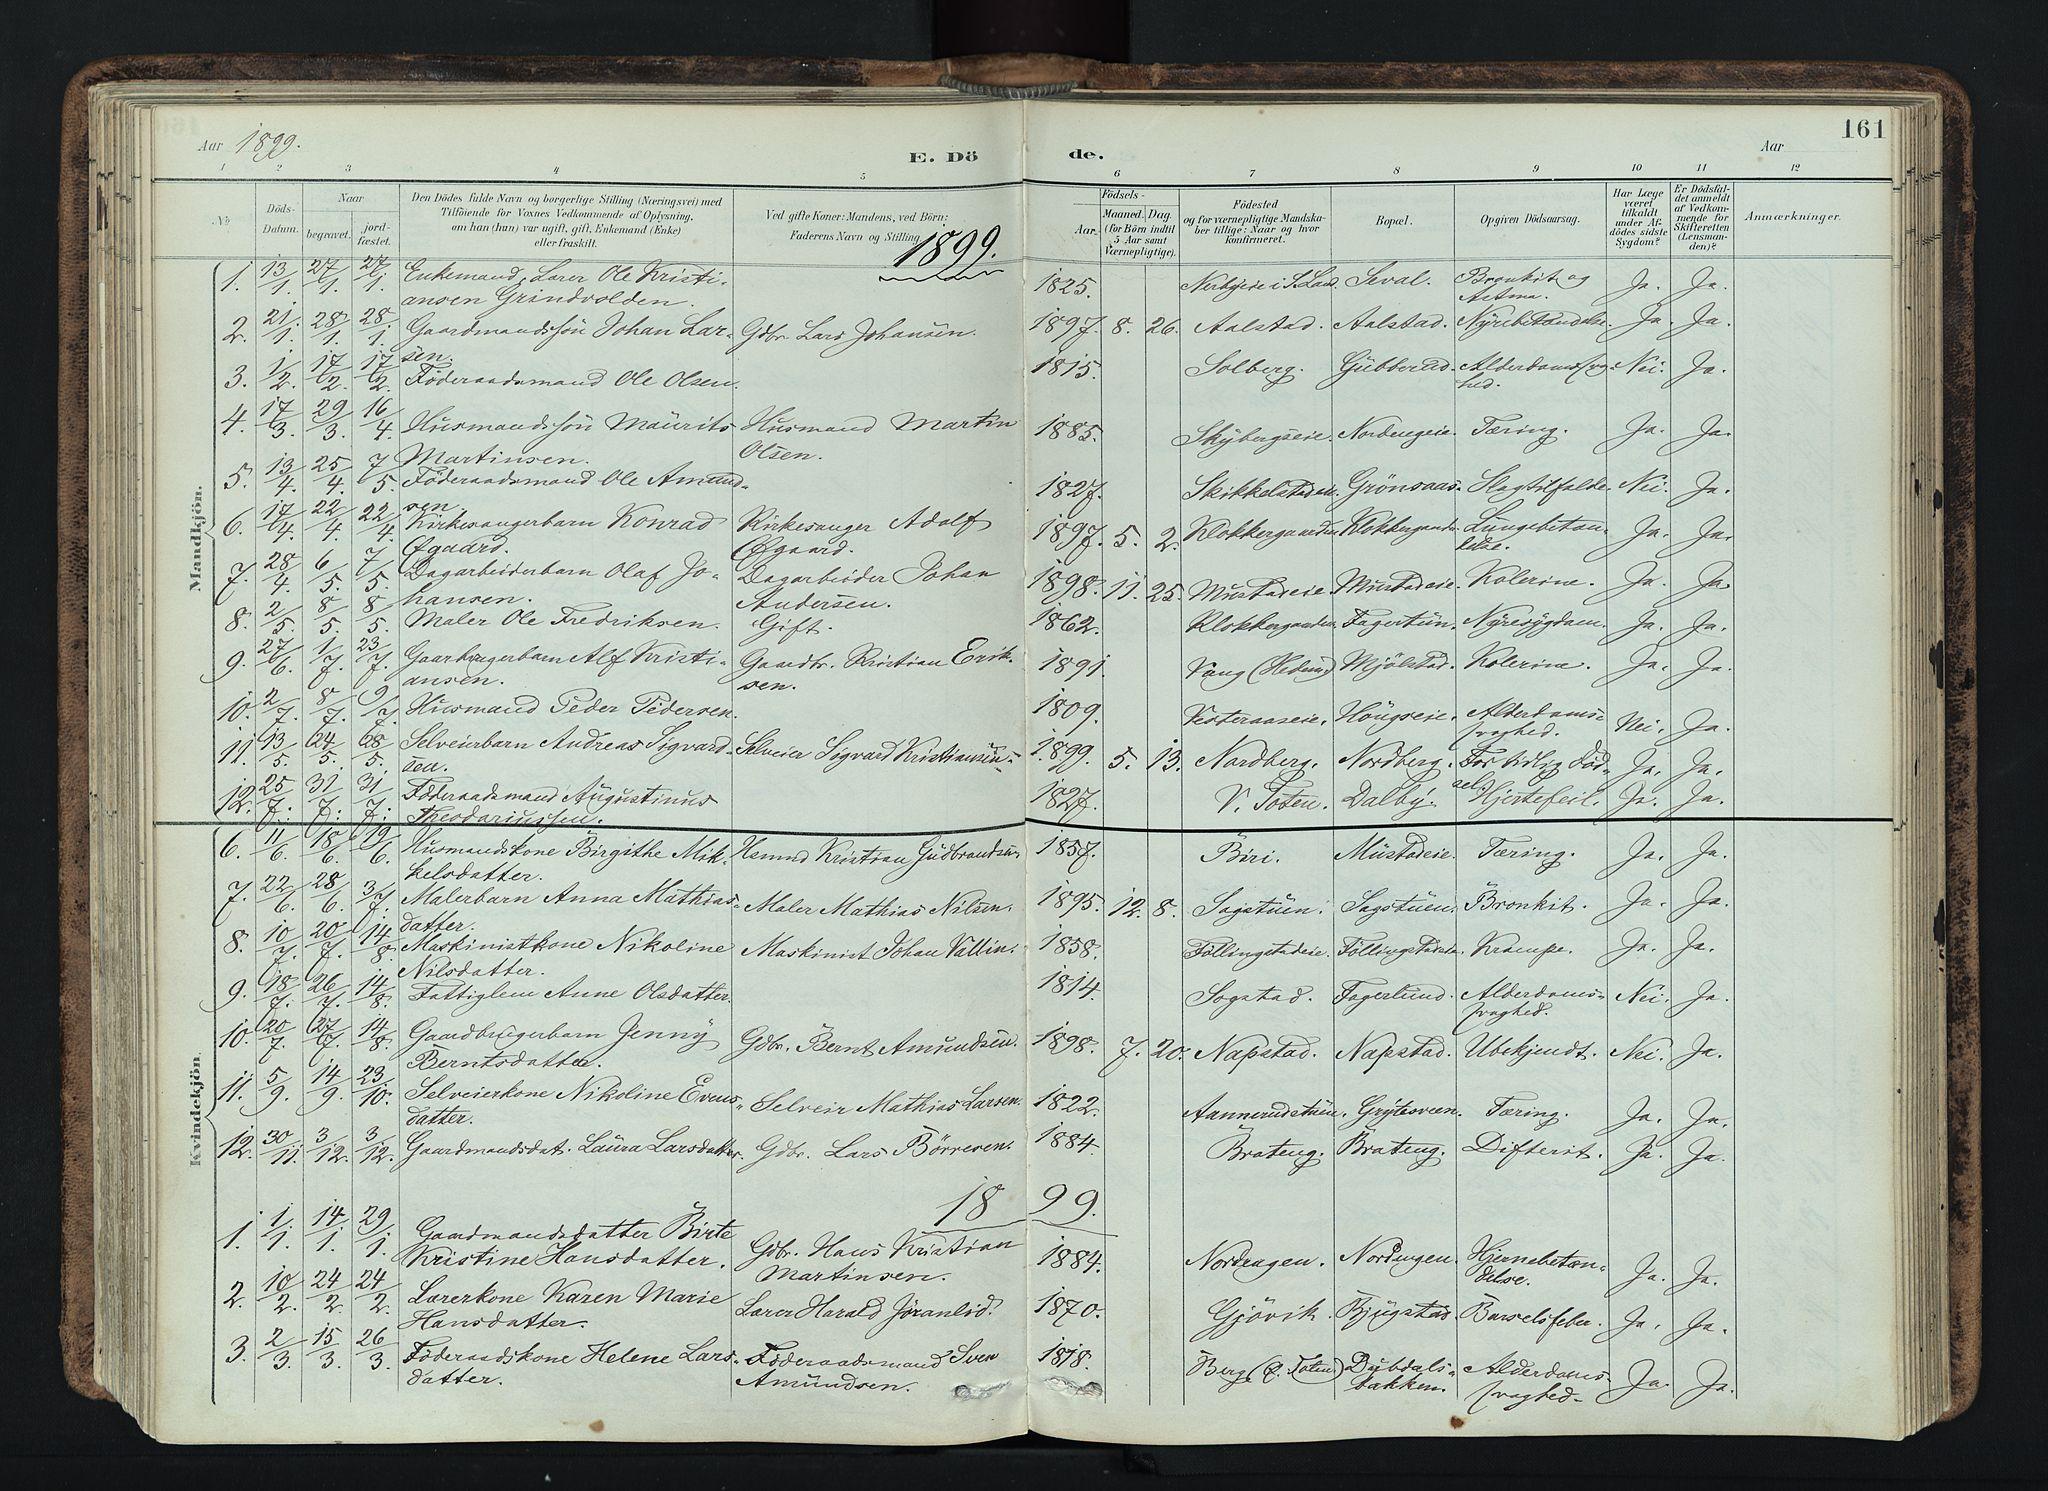 SAH, Vardal prestekontor, H/Ha/Haa/L0019: Ministerialbok nr. 19, 1893-1907, s. 161